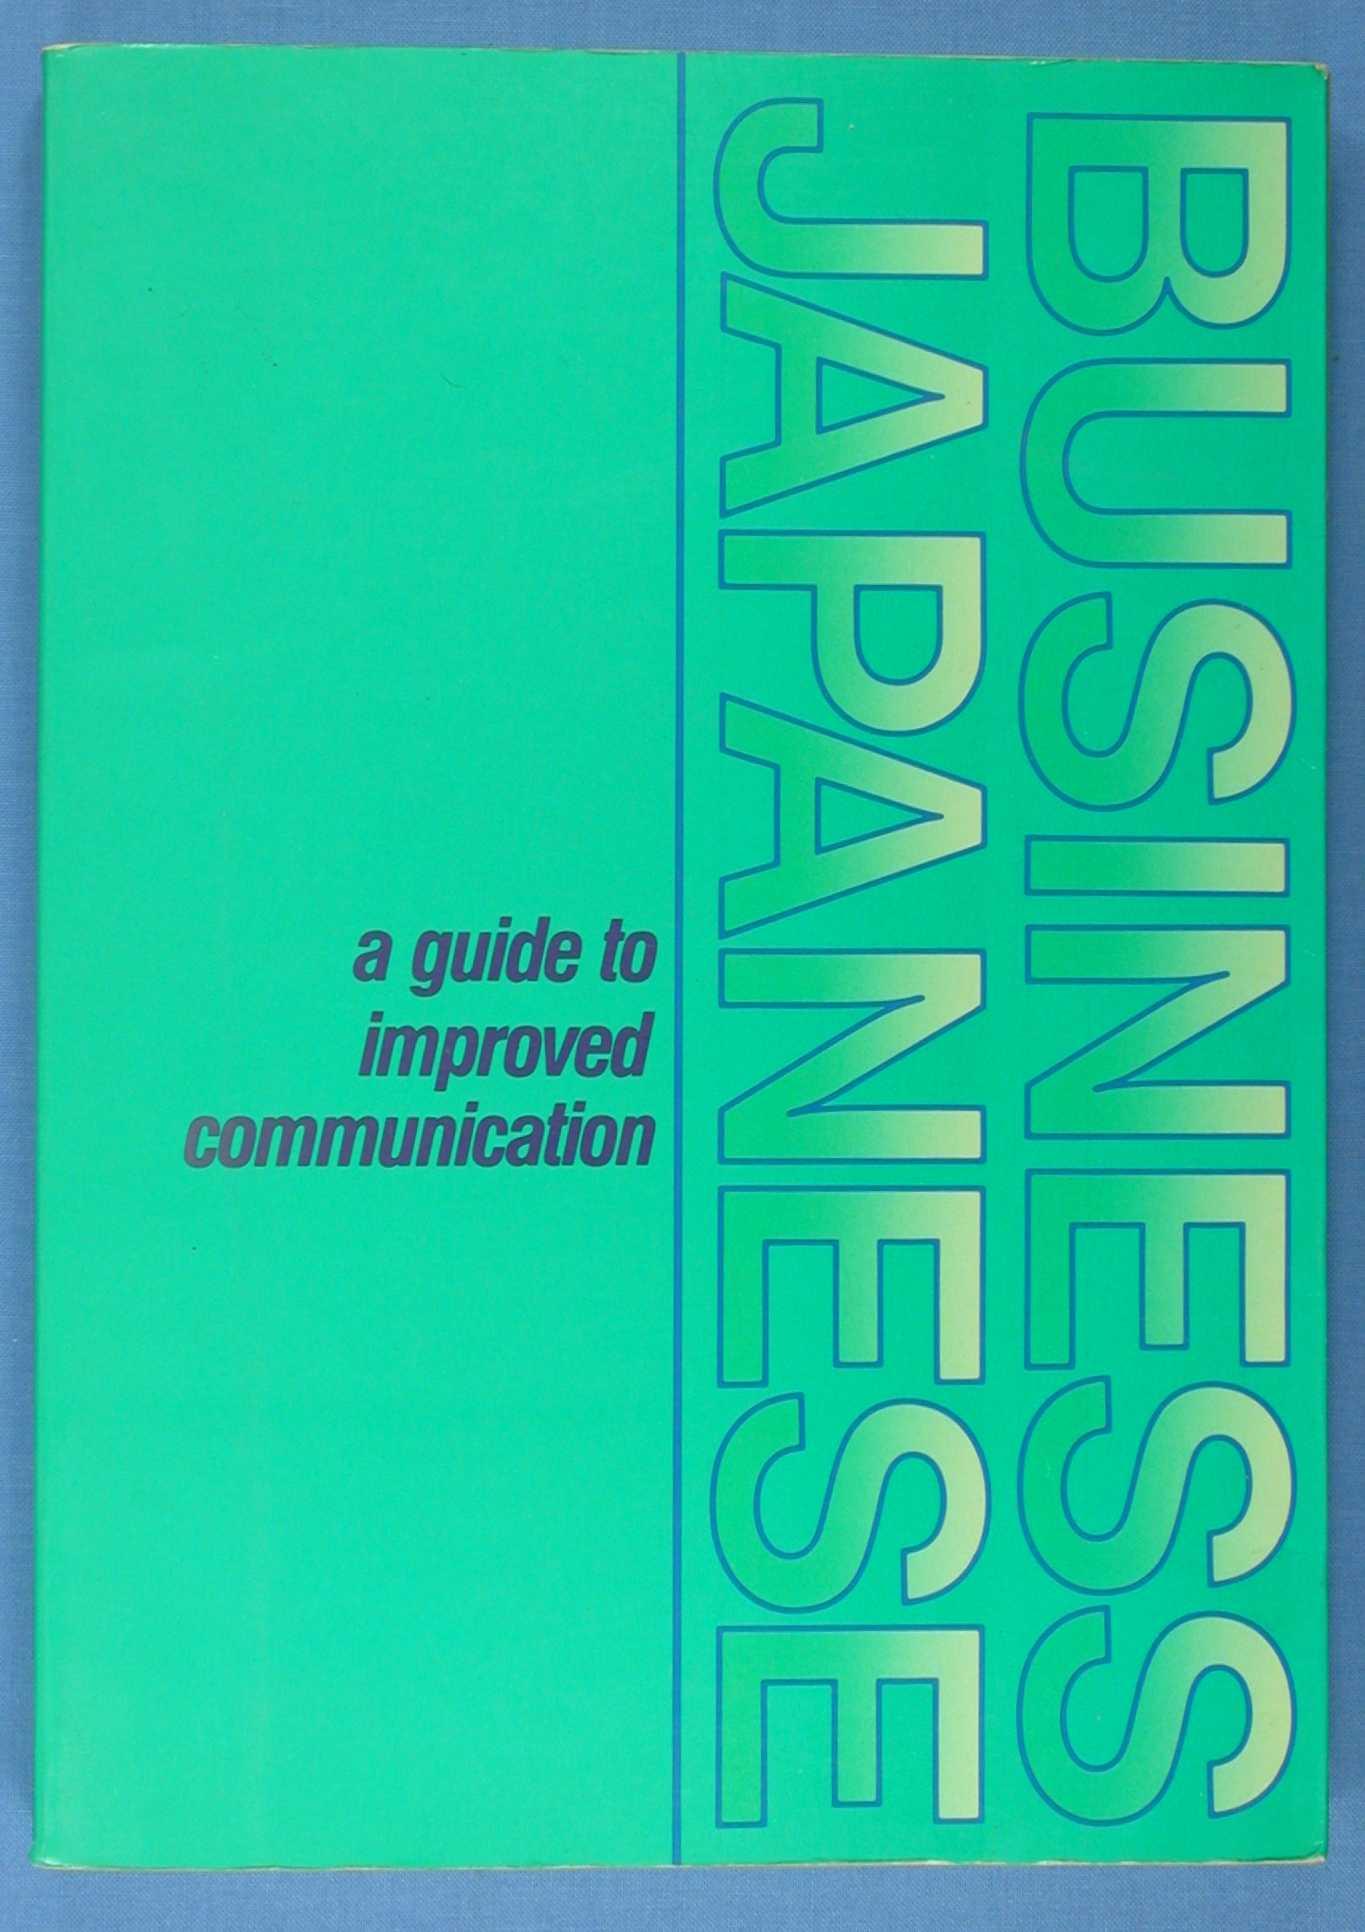 Business Japanese: A Guide to Improved Communication, Taiji Hosokawa; Hajime Takamizawa; NIssan Motor Co.